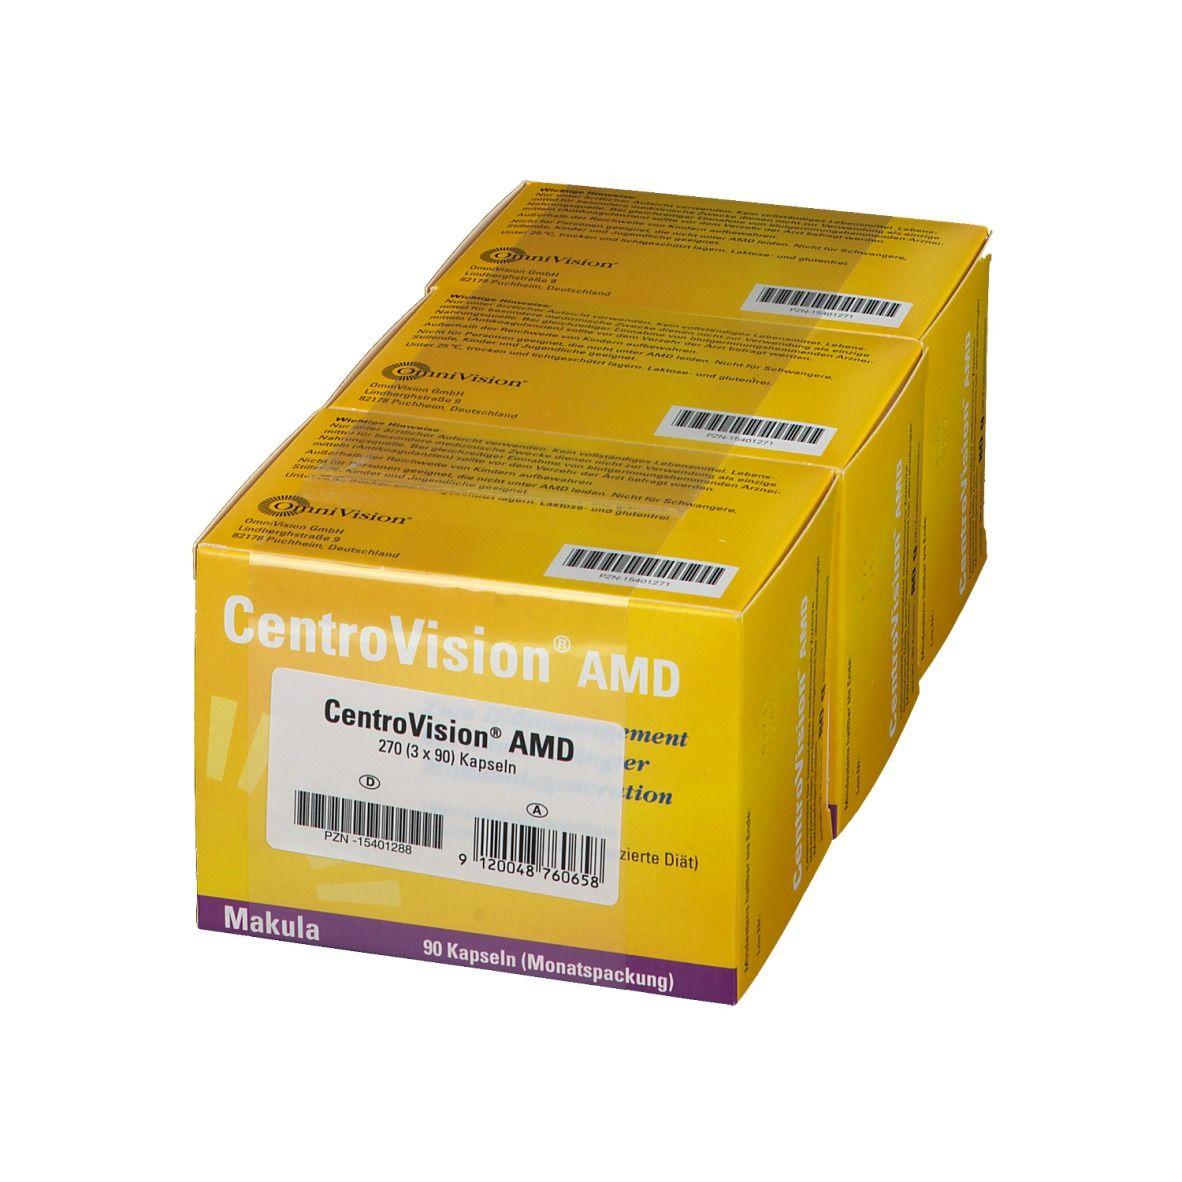 CentroVision® AMD